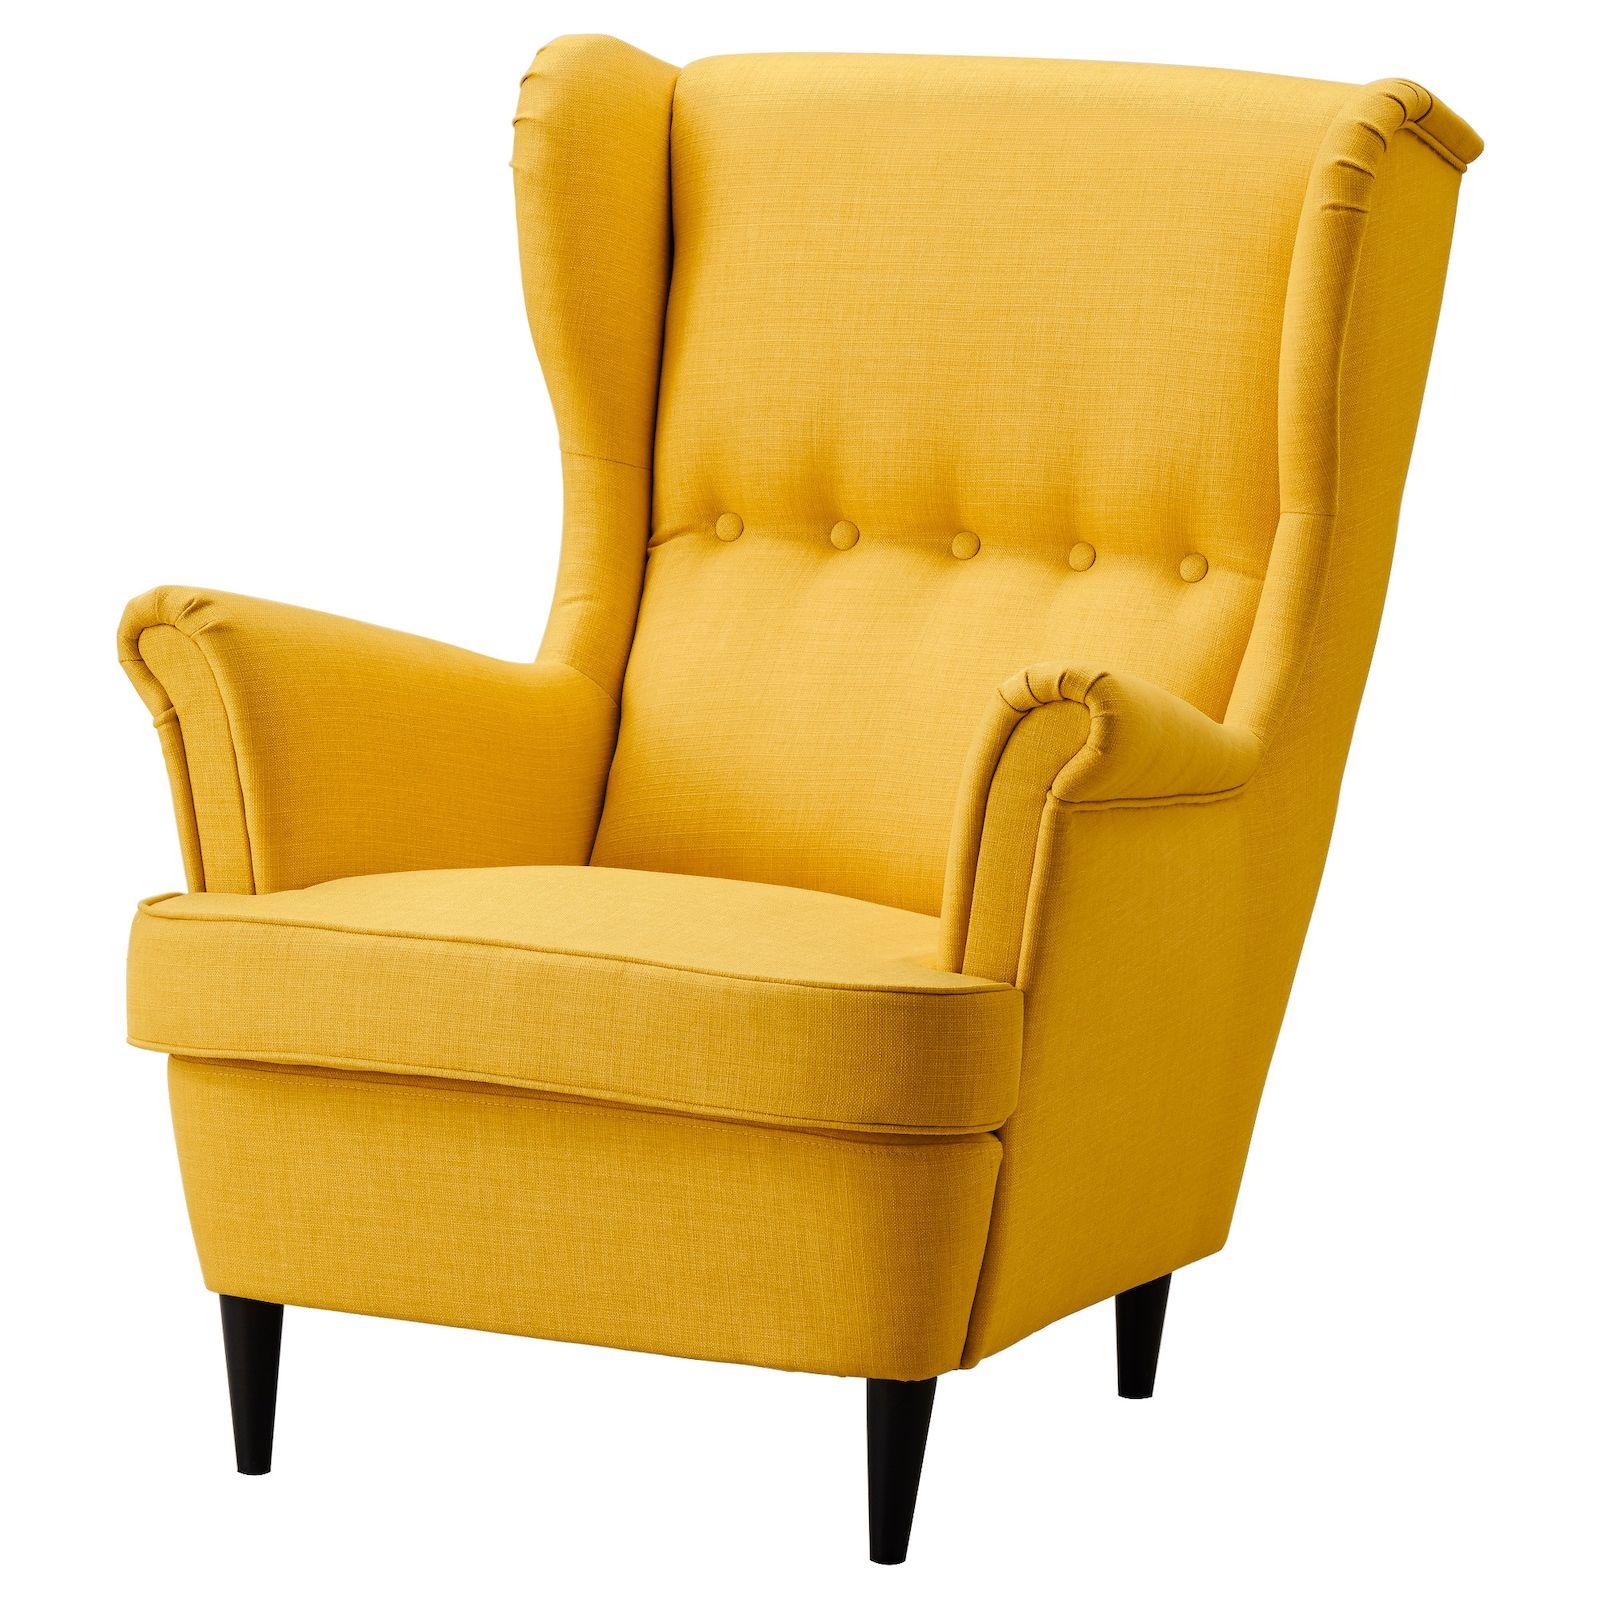 Strandmon Ohrensessel Skiftebo Gelb Ikea Deutschland Ikea Chair Ikea Strandmon Wing Chair